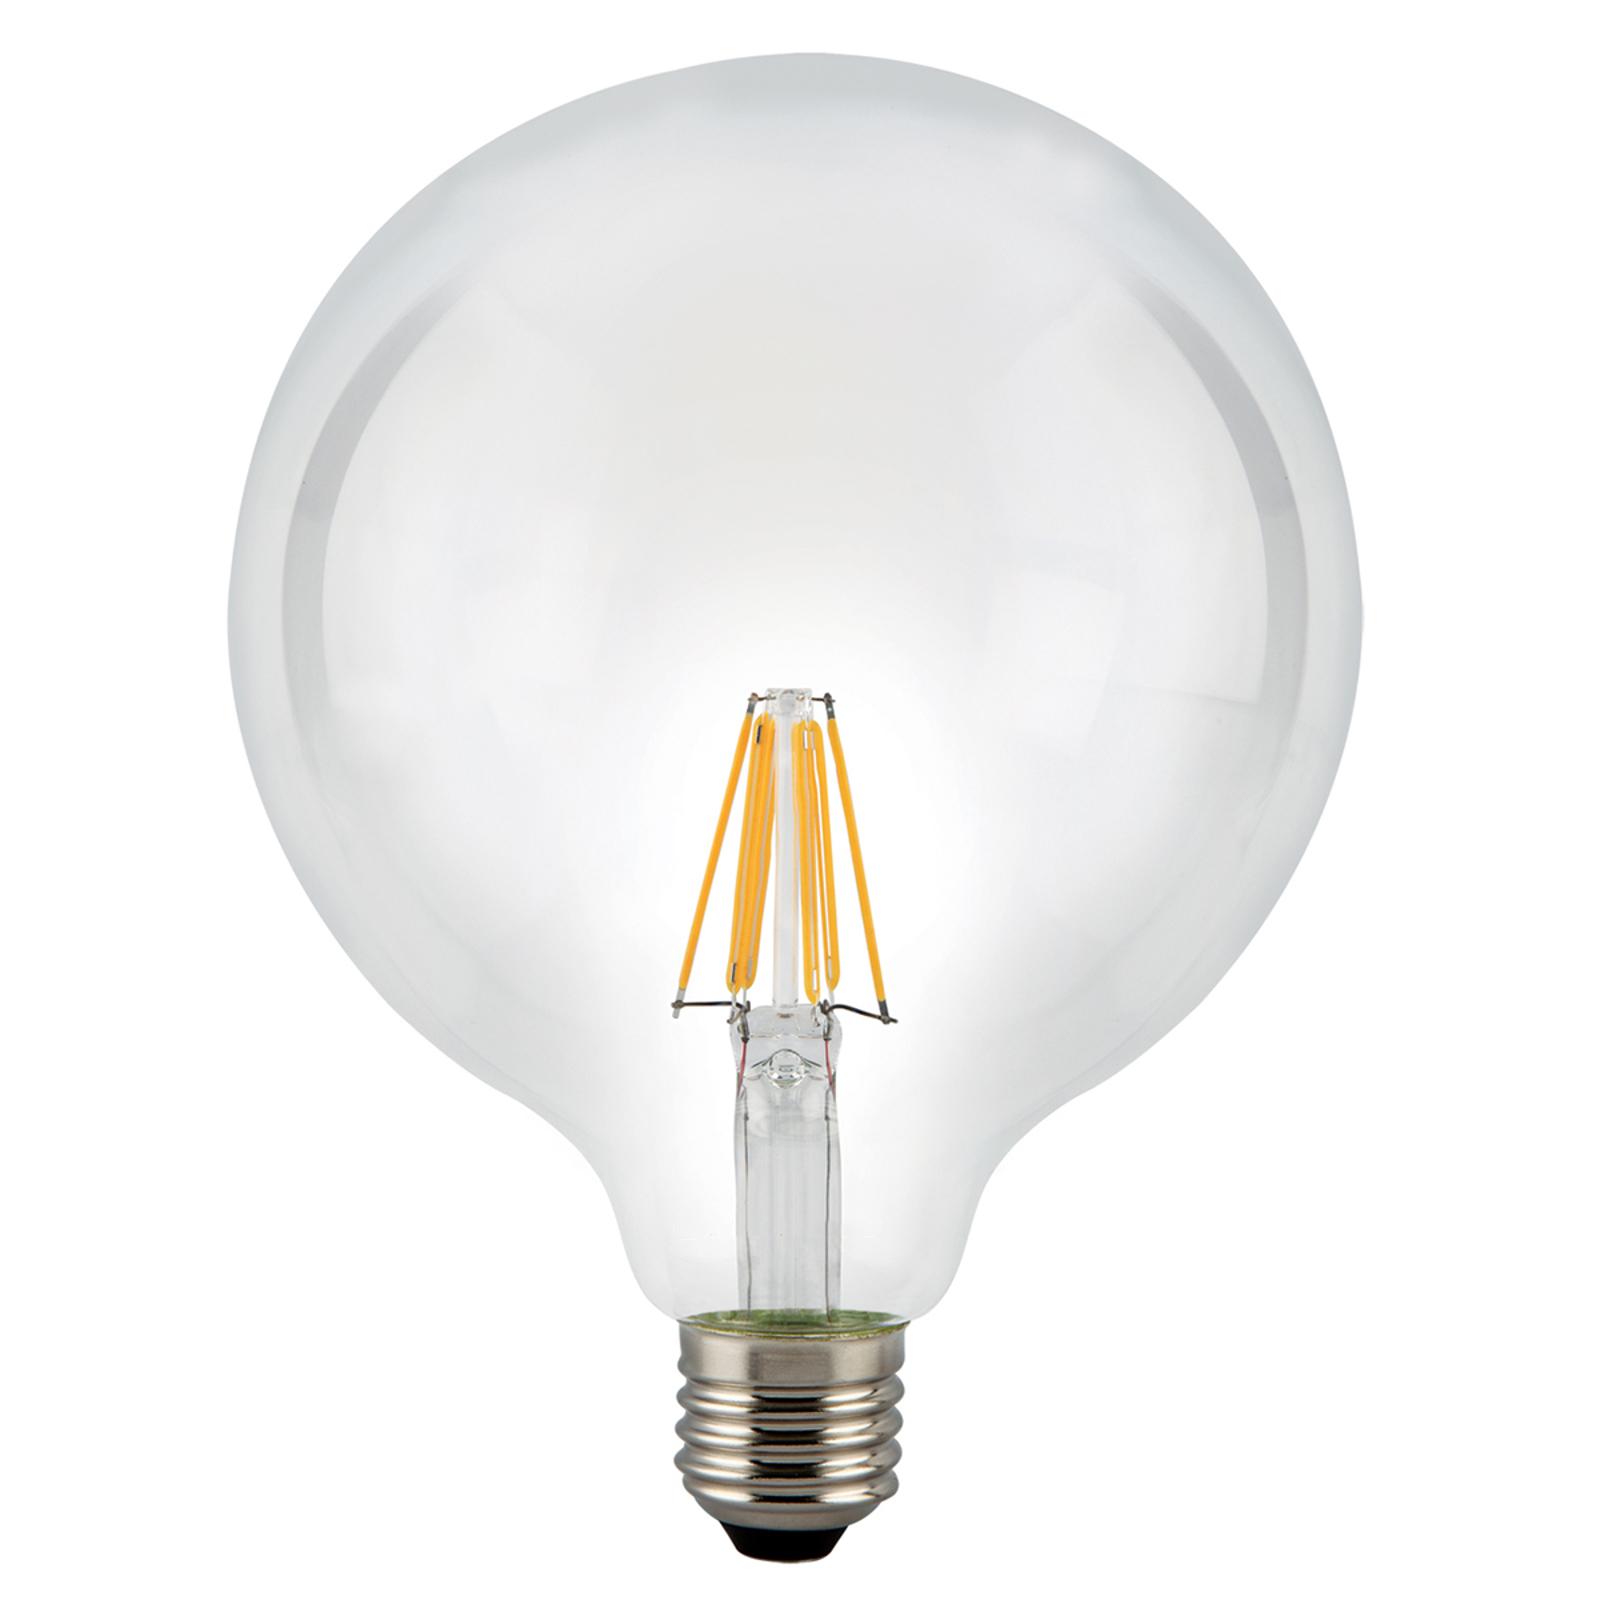 Ampoule globe LED E27 8W 827, transparent